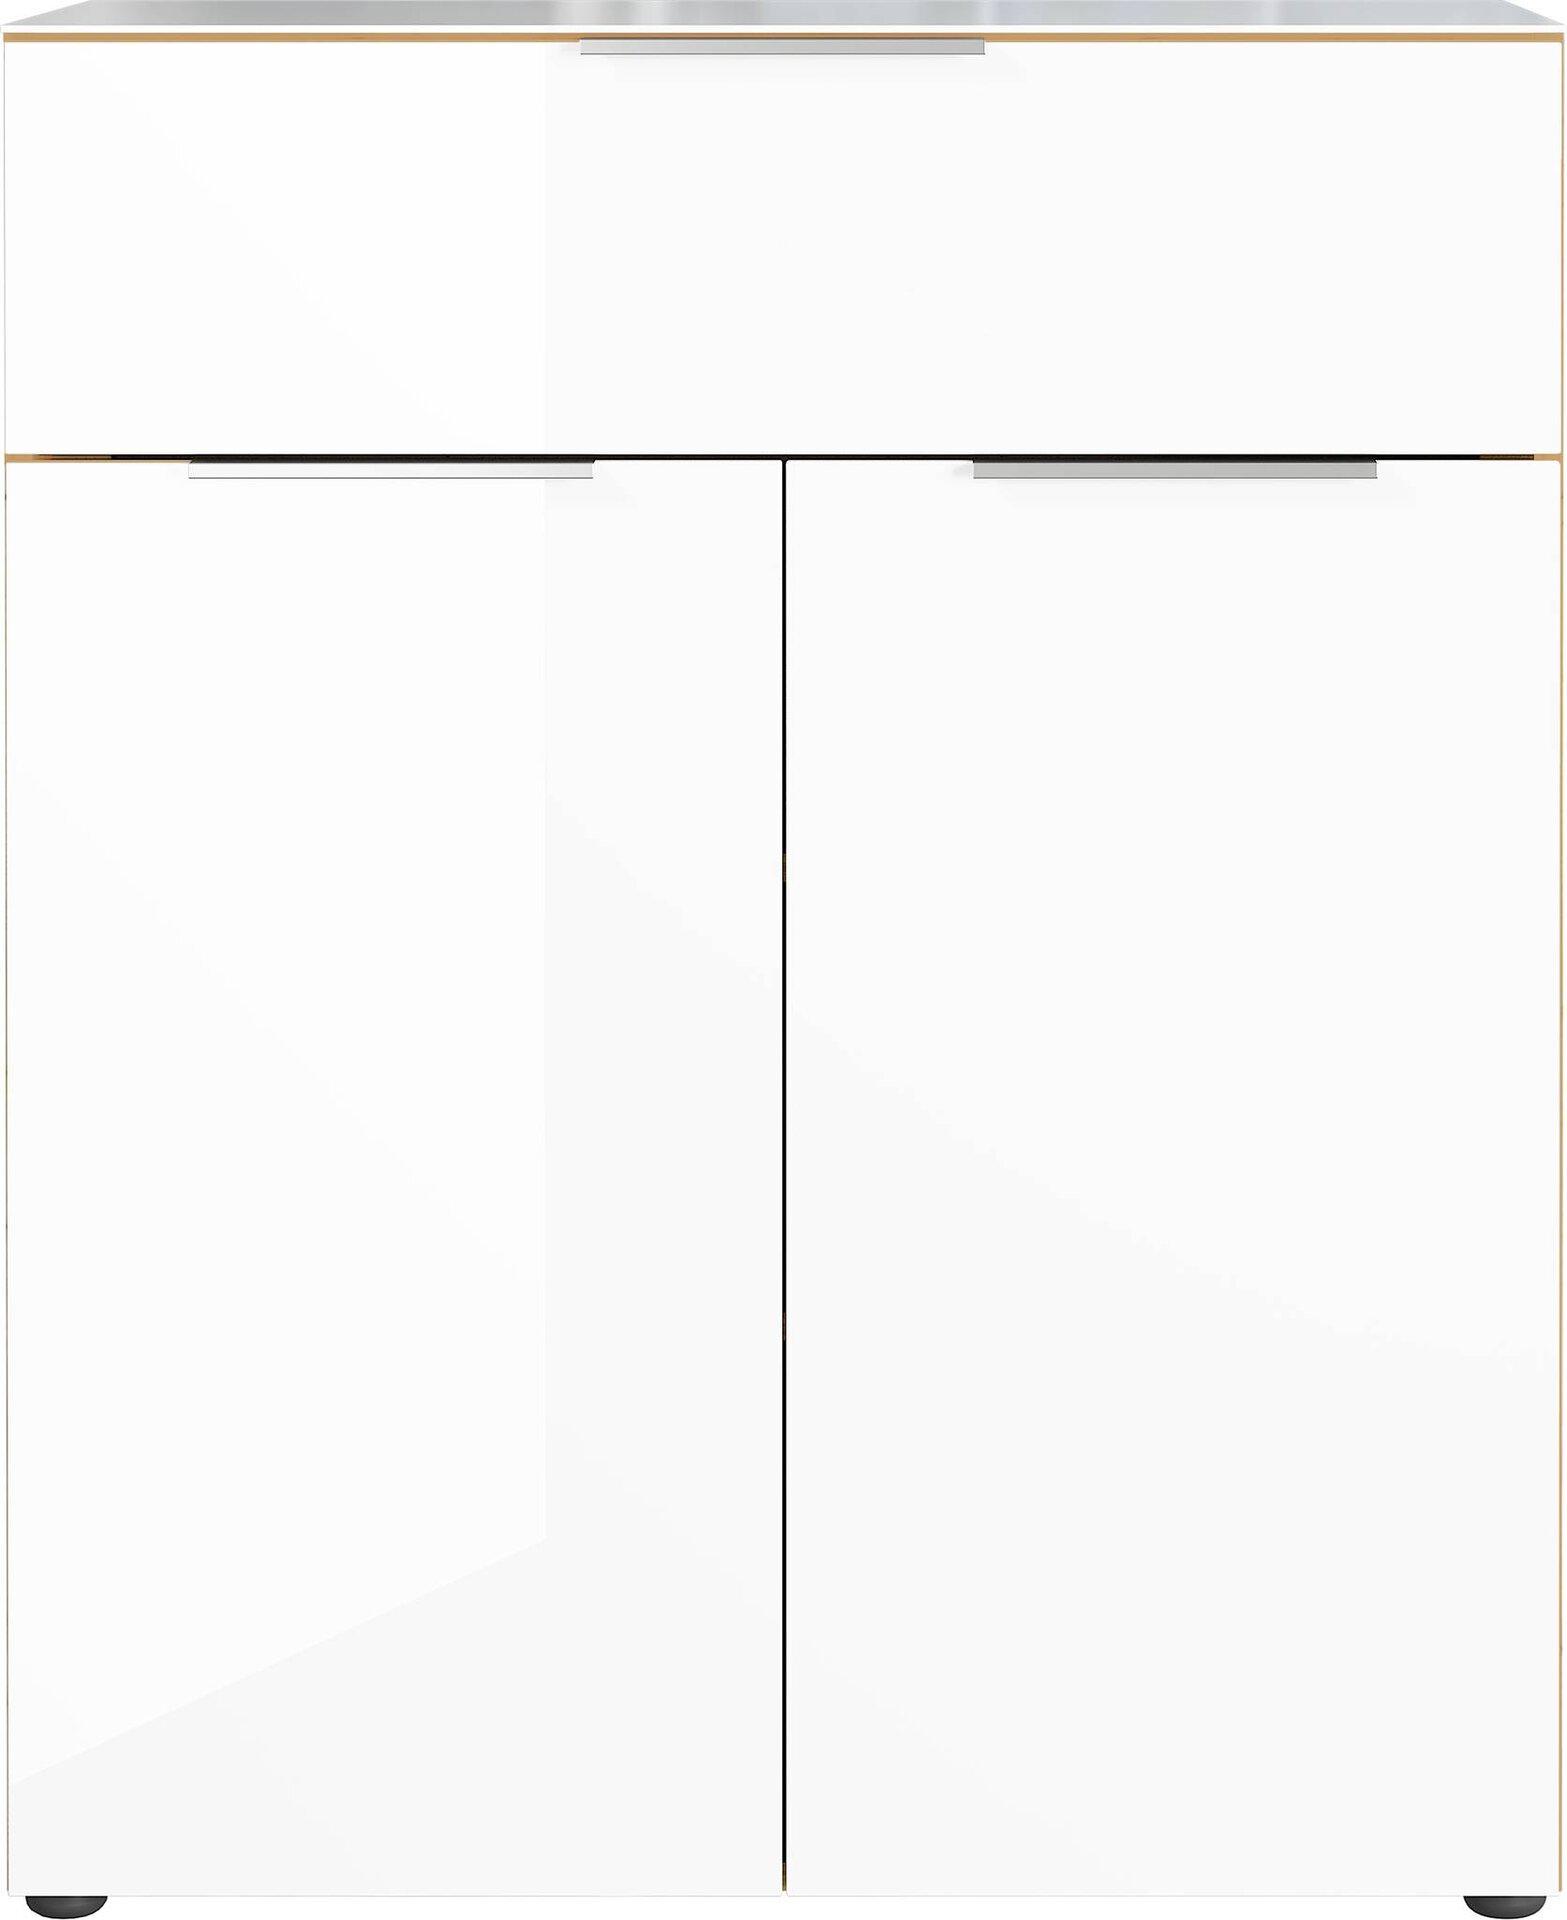 Kommode GW-OAKLAND Germania Holzwerkstoff mehrfarbig 42 x 102 x 83 cm